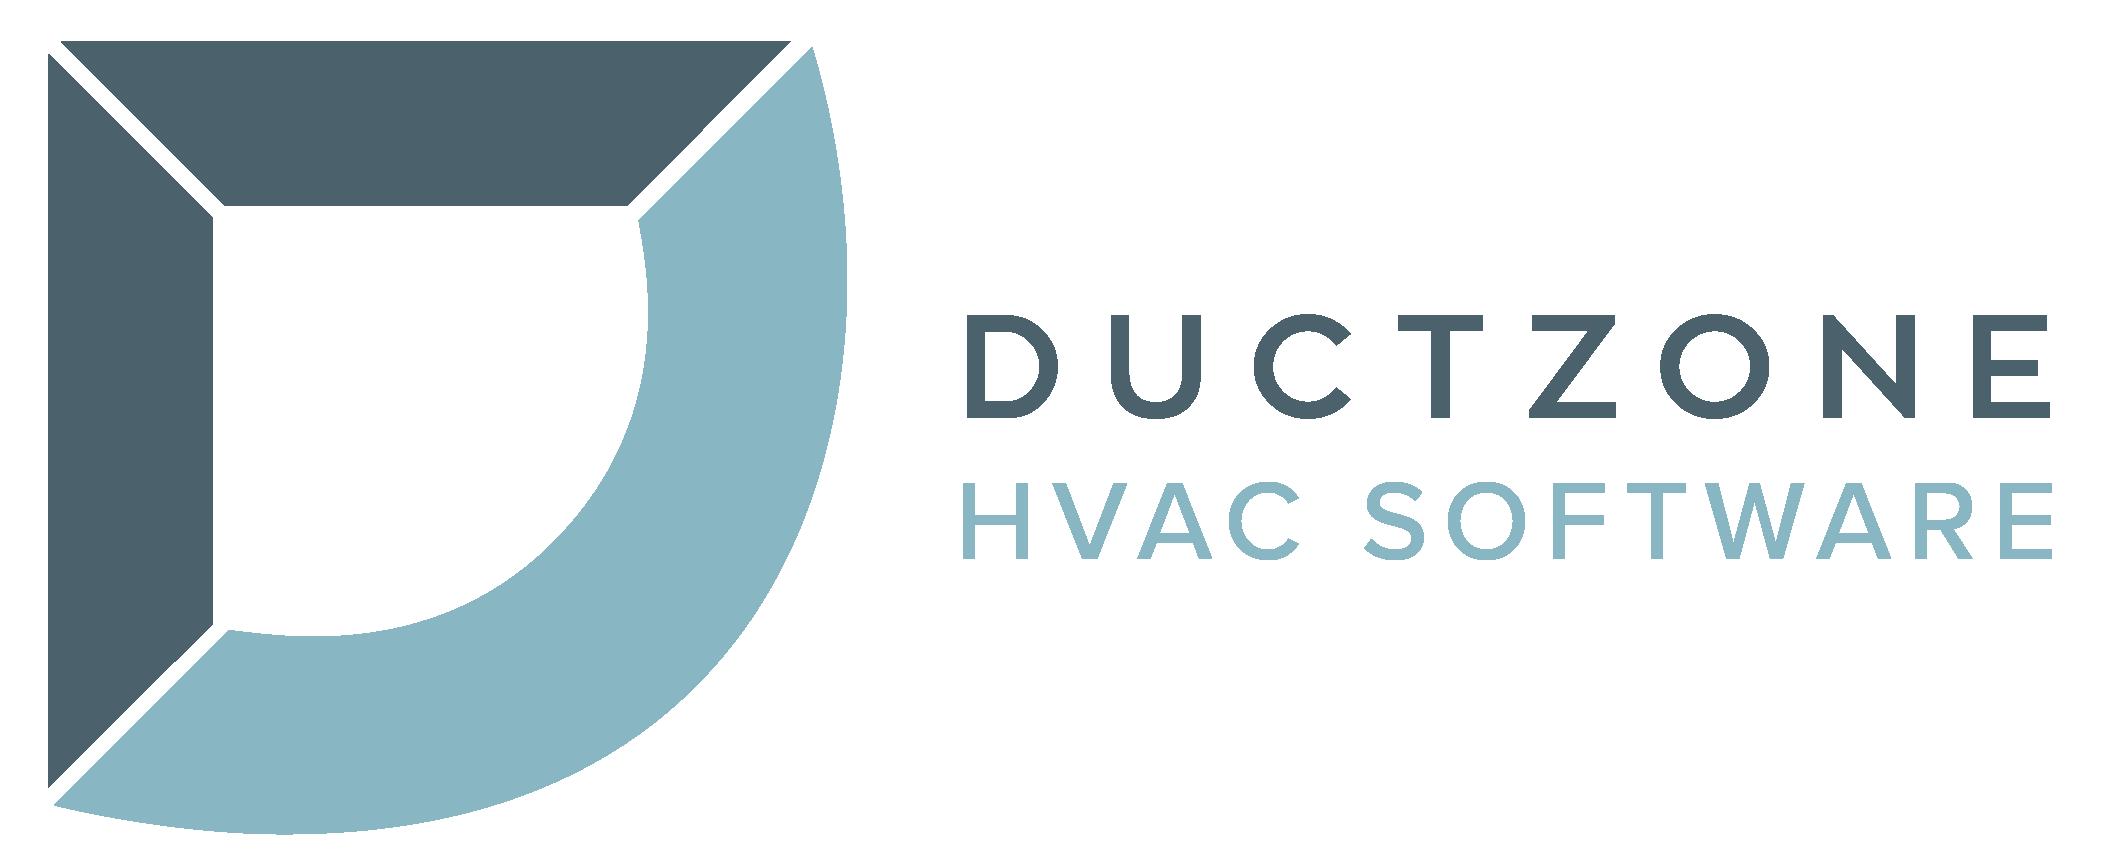 ductzone-1